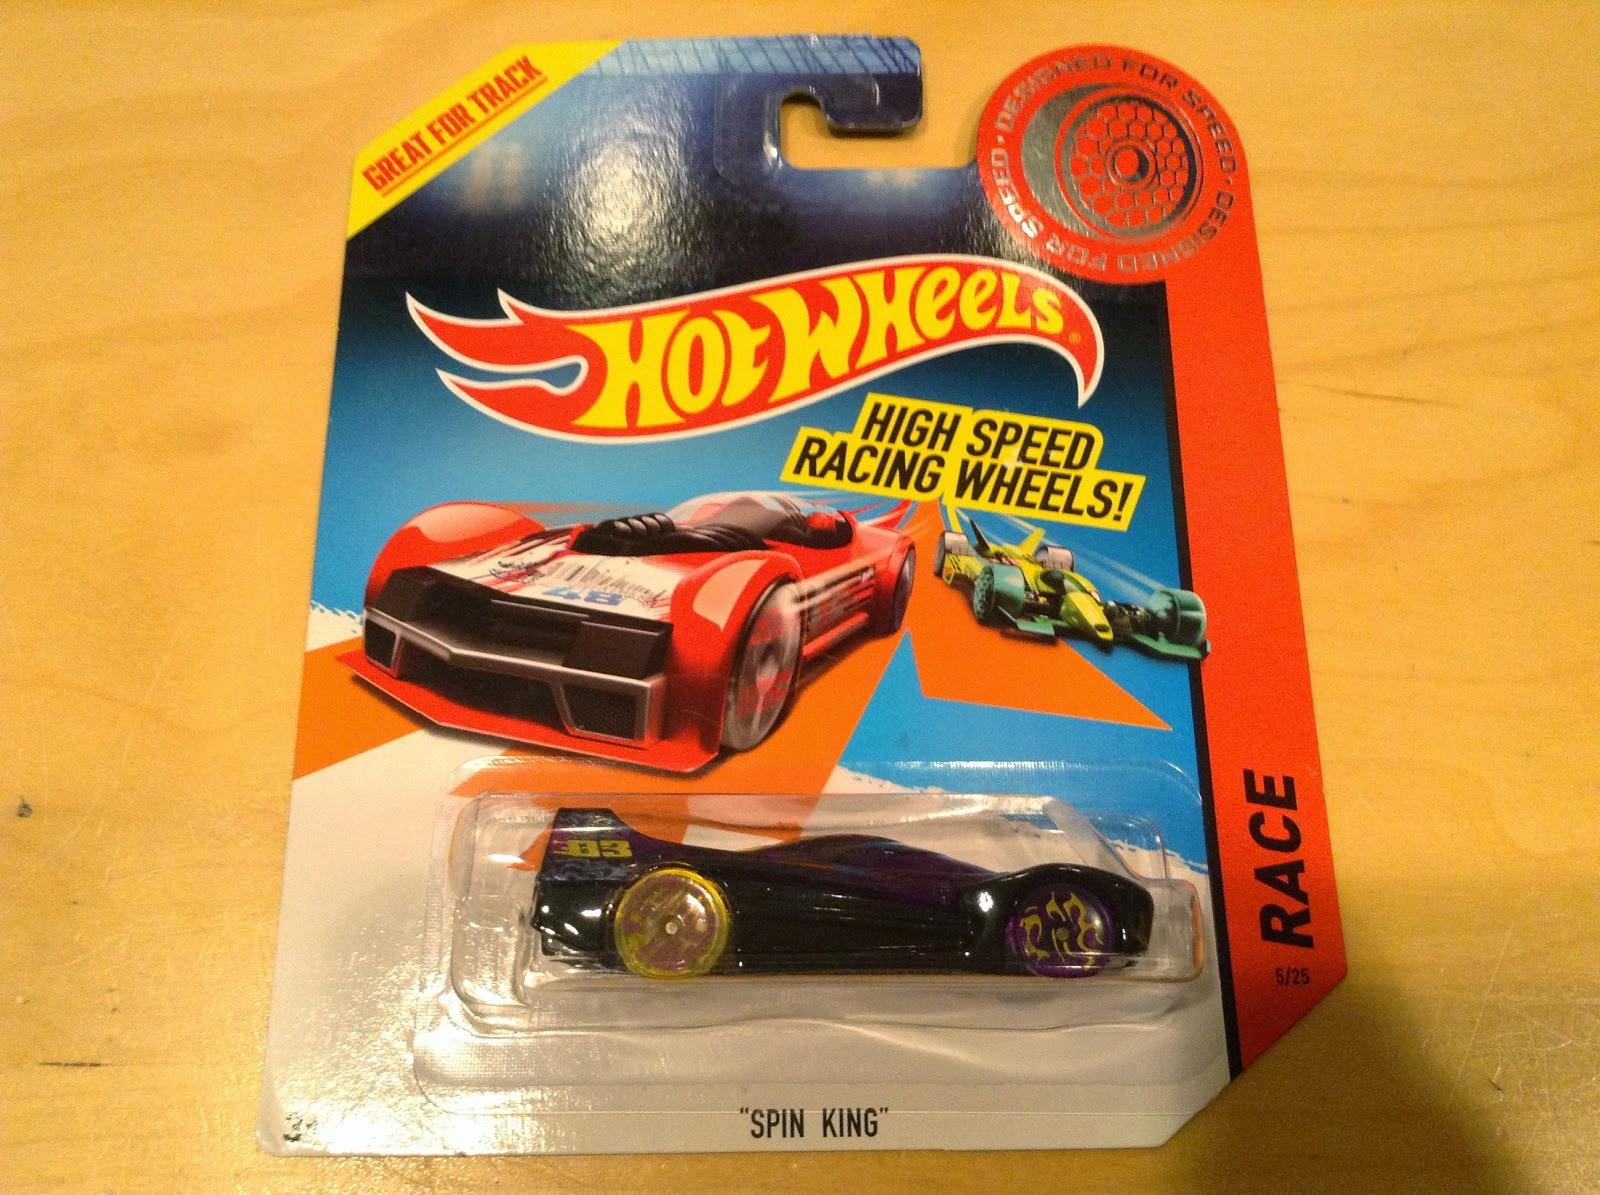 Hot Wheels High Speed Racing Wheels High Speed Racing Wheels